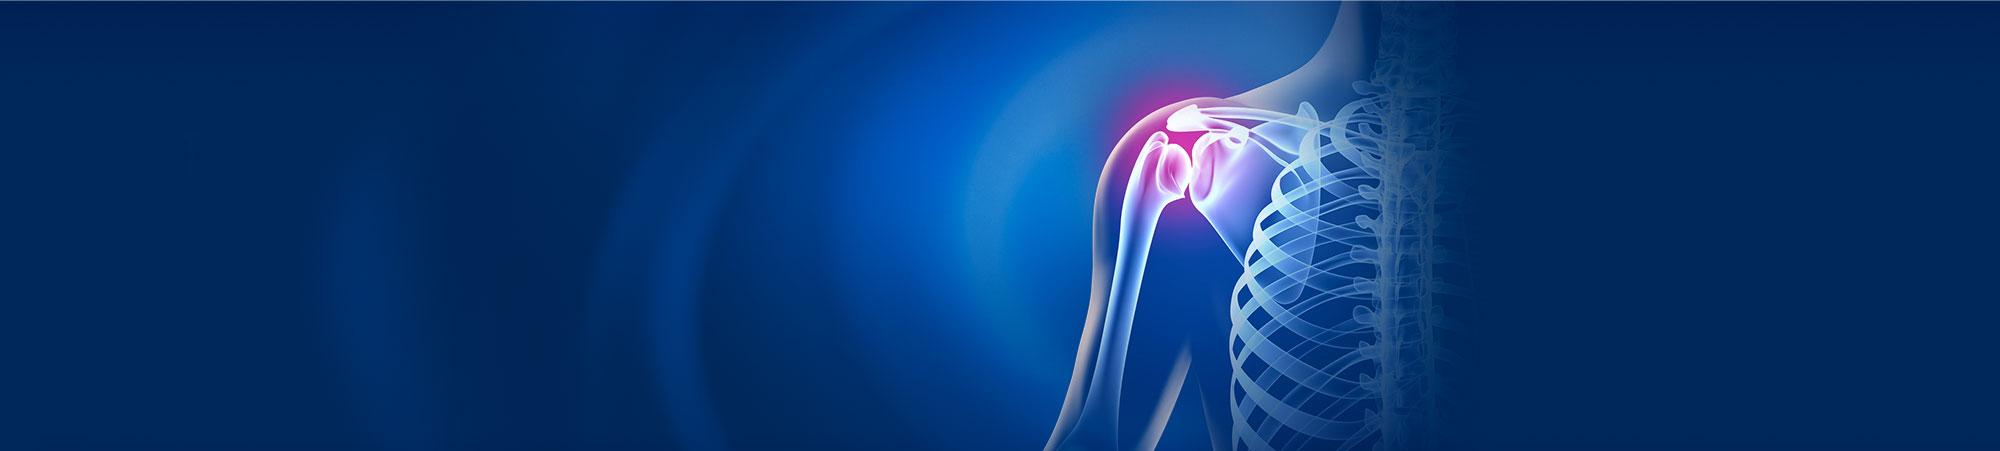 Orthopedic Surgery 2019 Banner